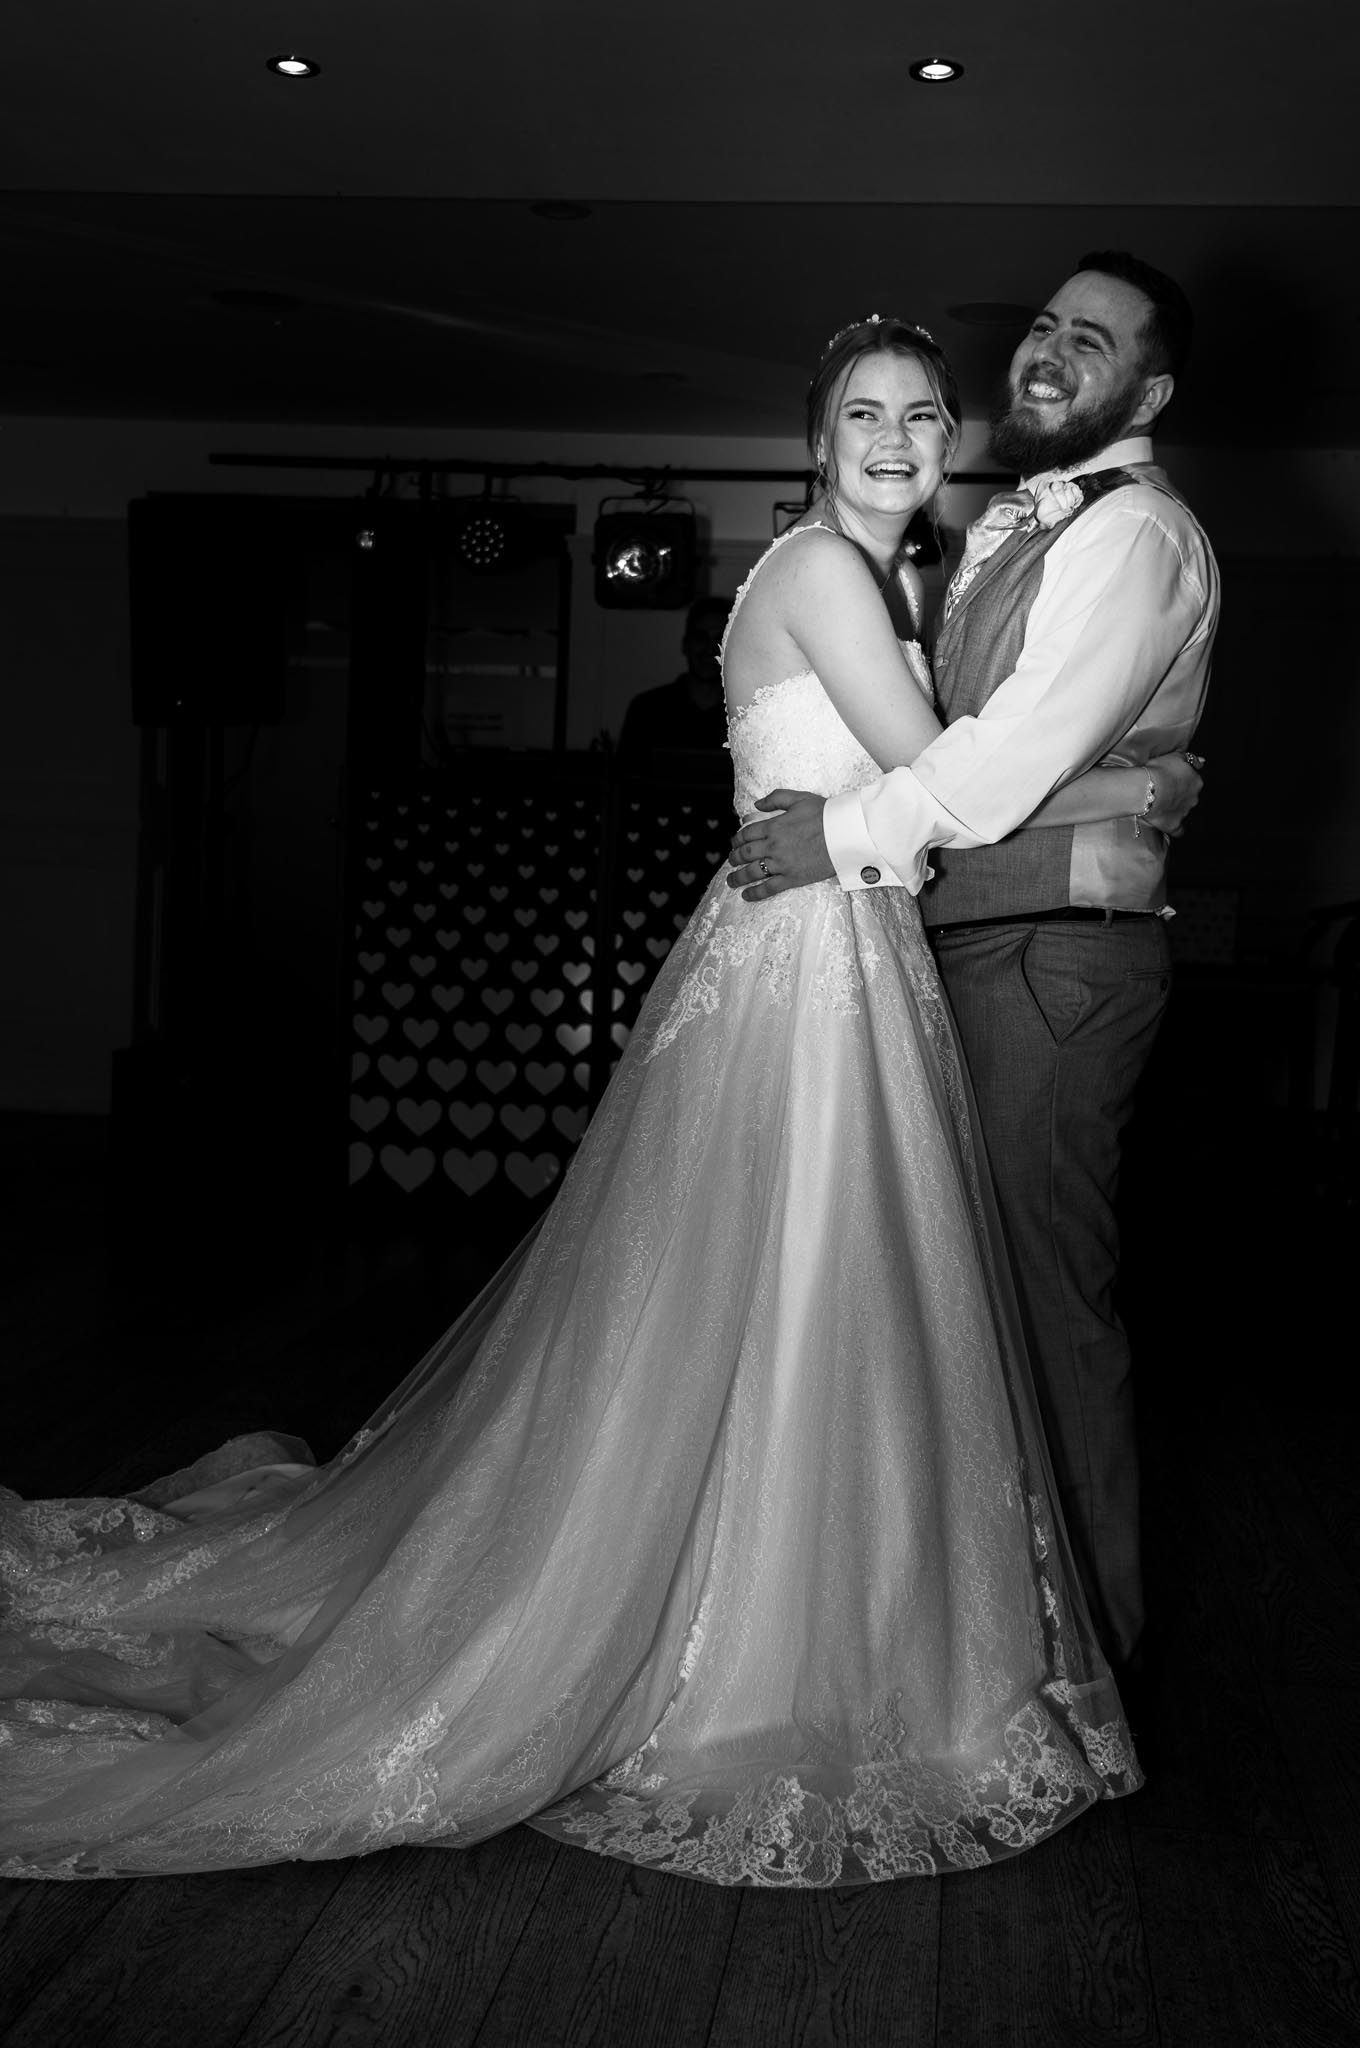 932-Night-Reception-Luke-Yasmin-The-Rayleigh-Club-Wedding-Photography.jpg